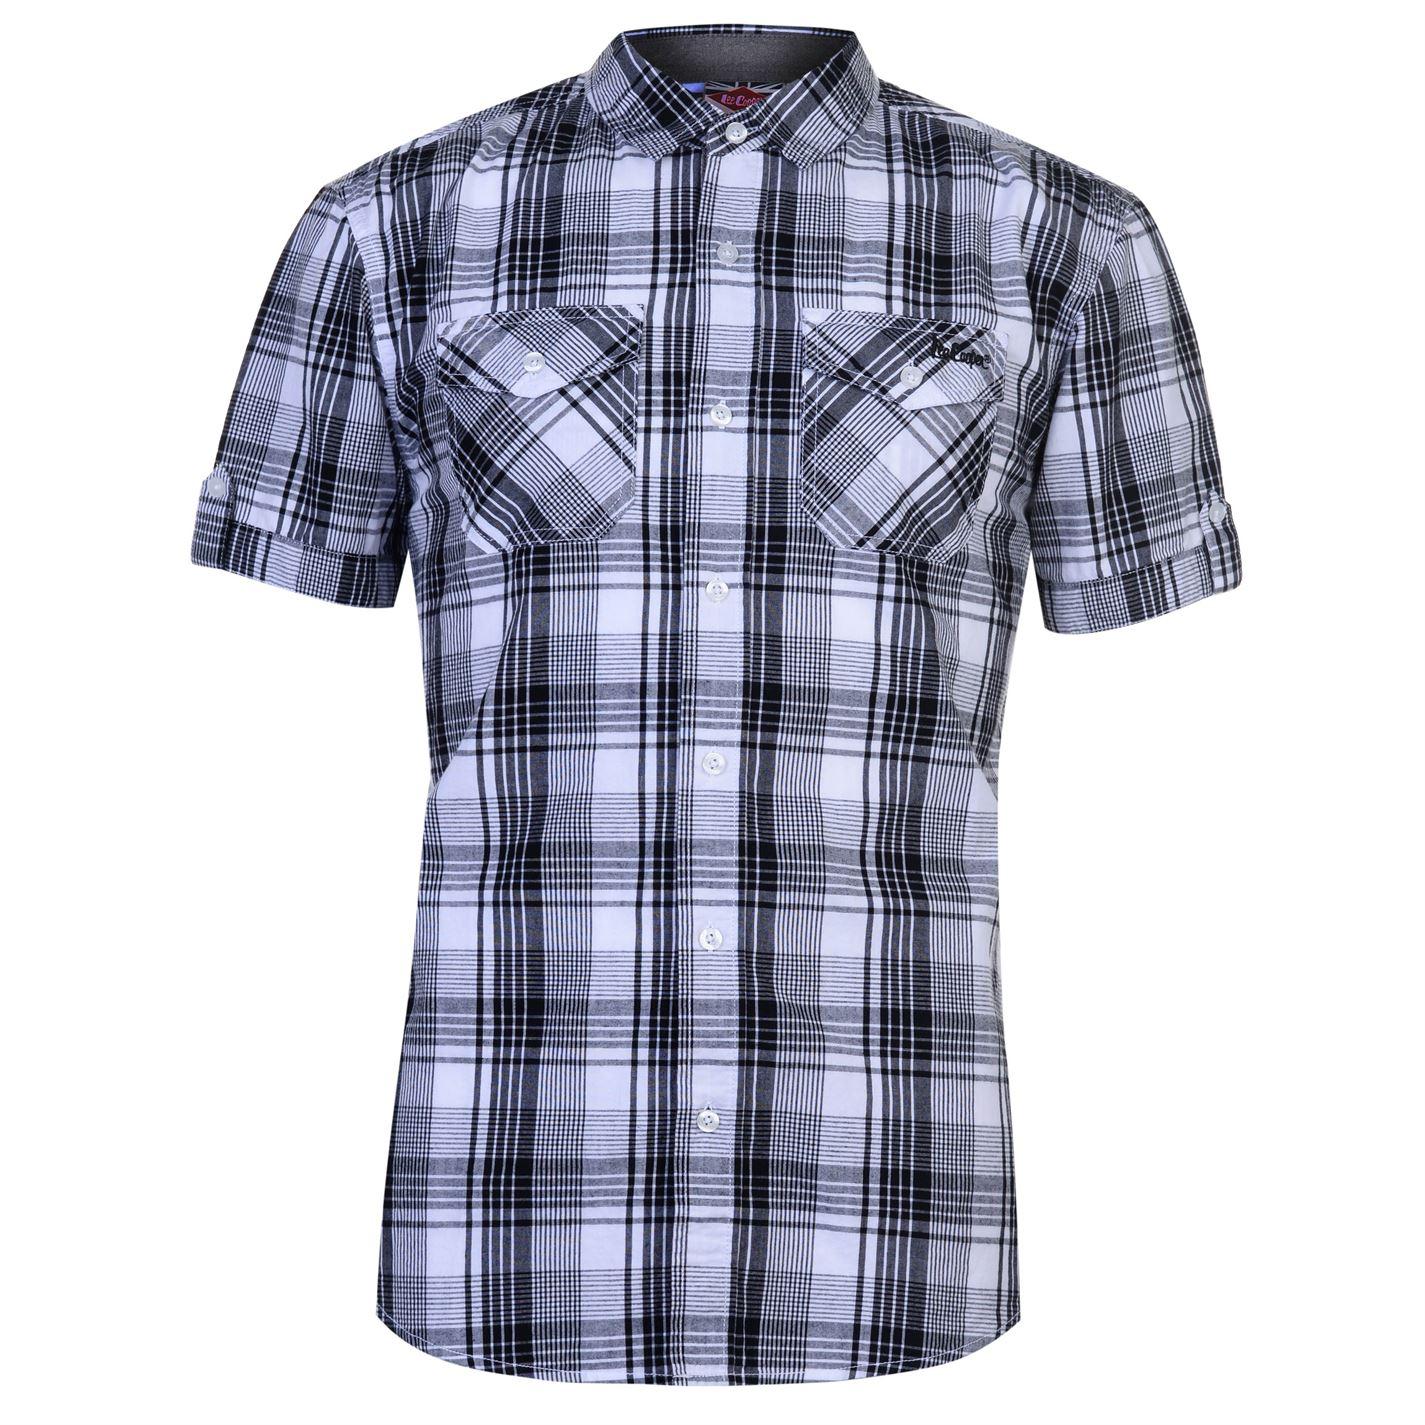 Lee Cooper SS Check Shirt Mens